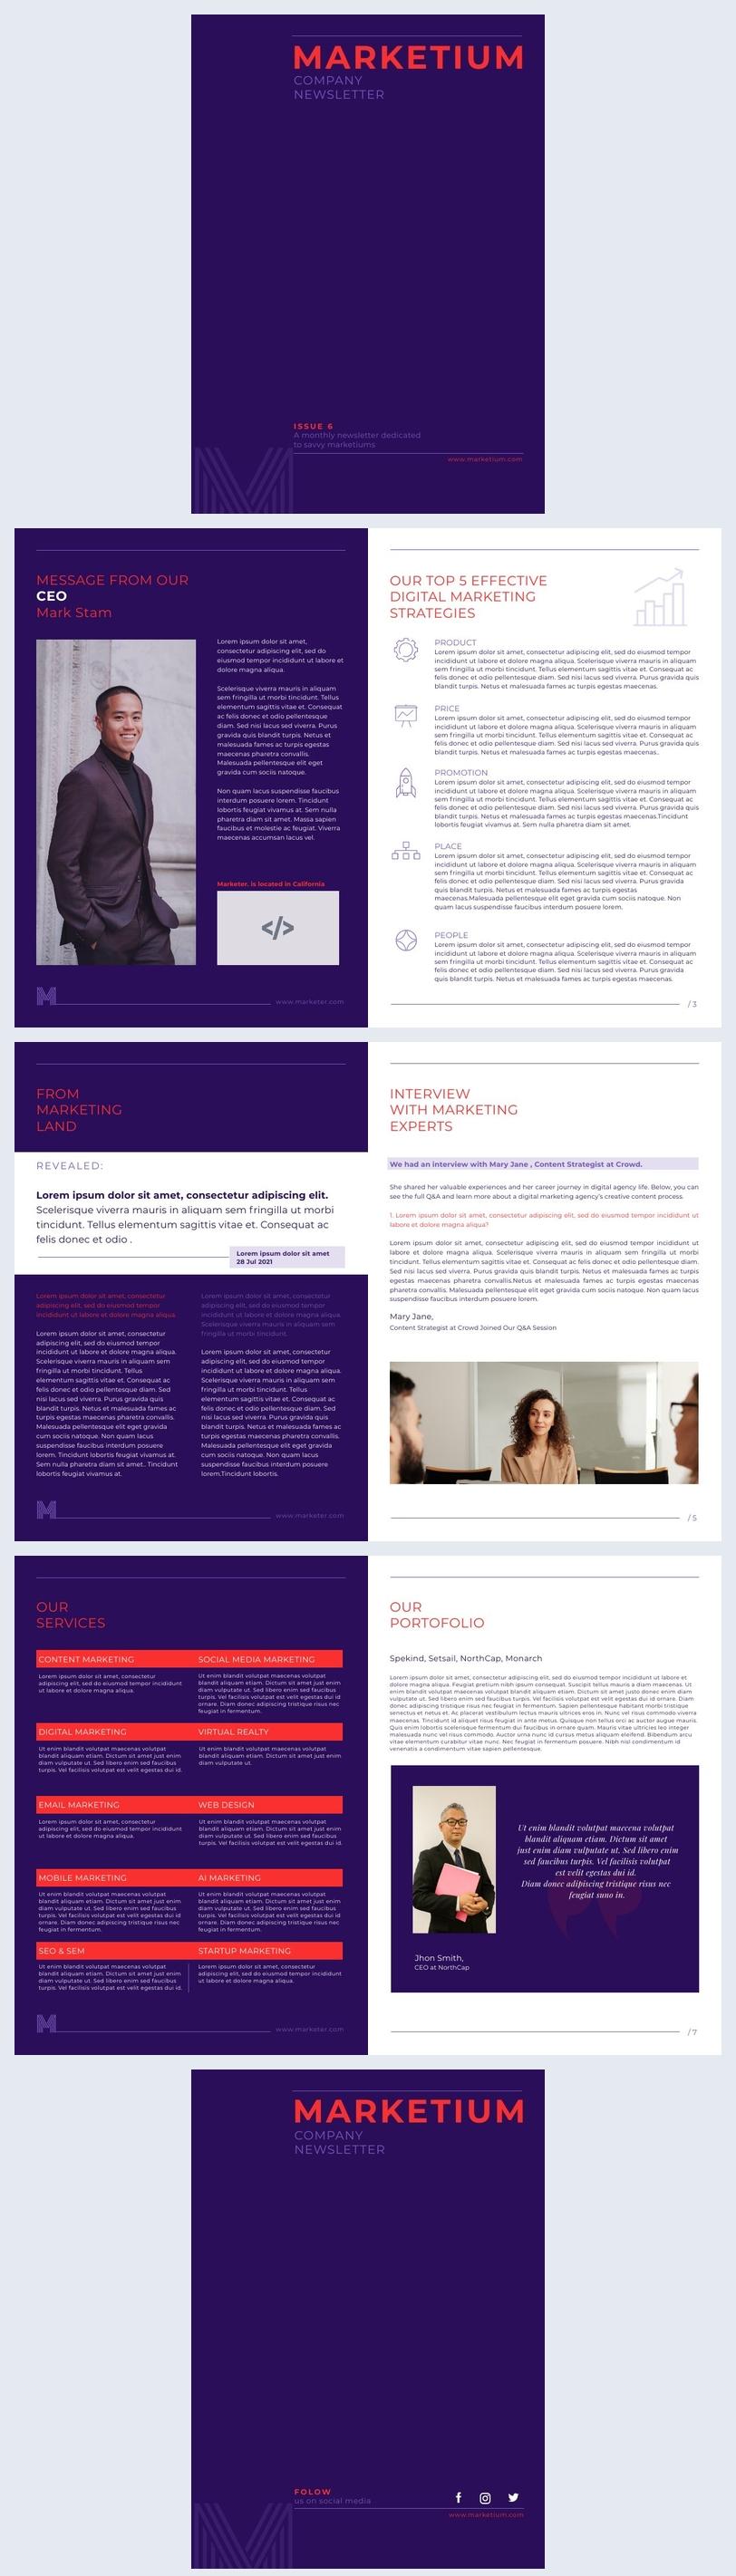 Exemplo de Design de Newsletter de Marketing Interativo